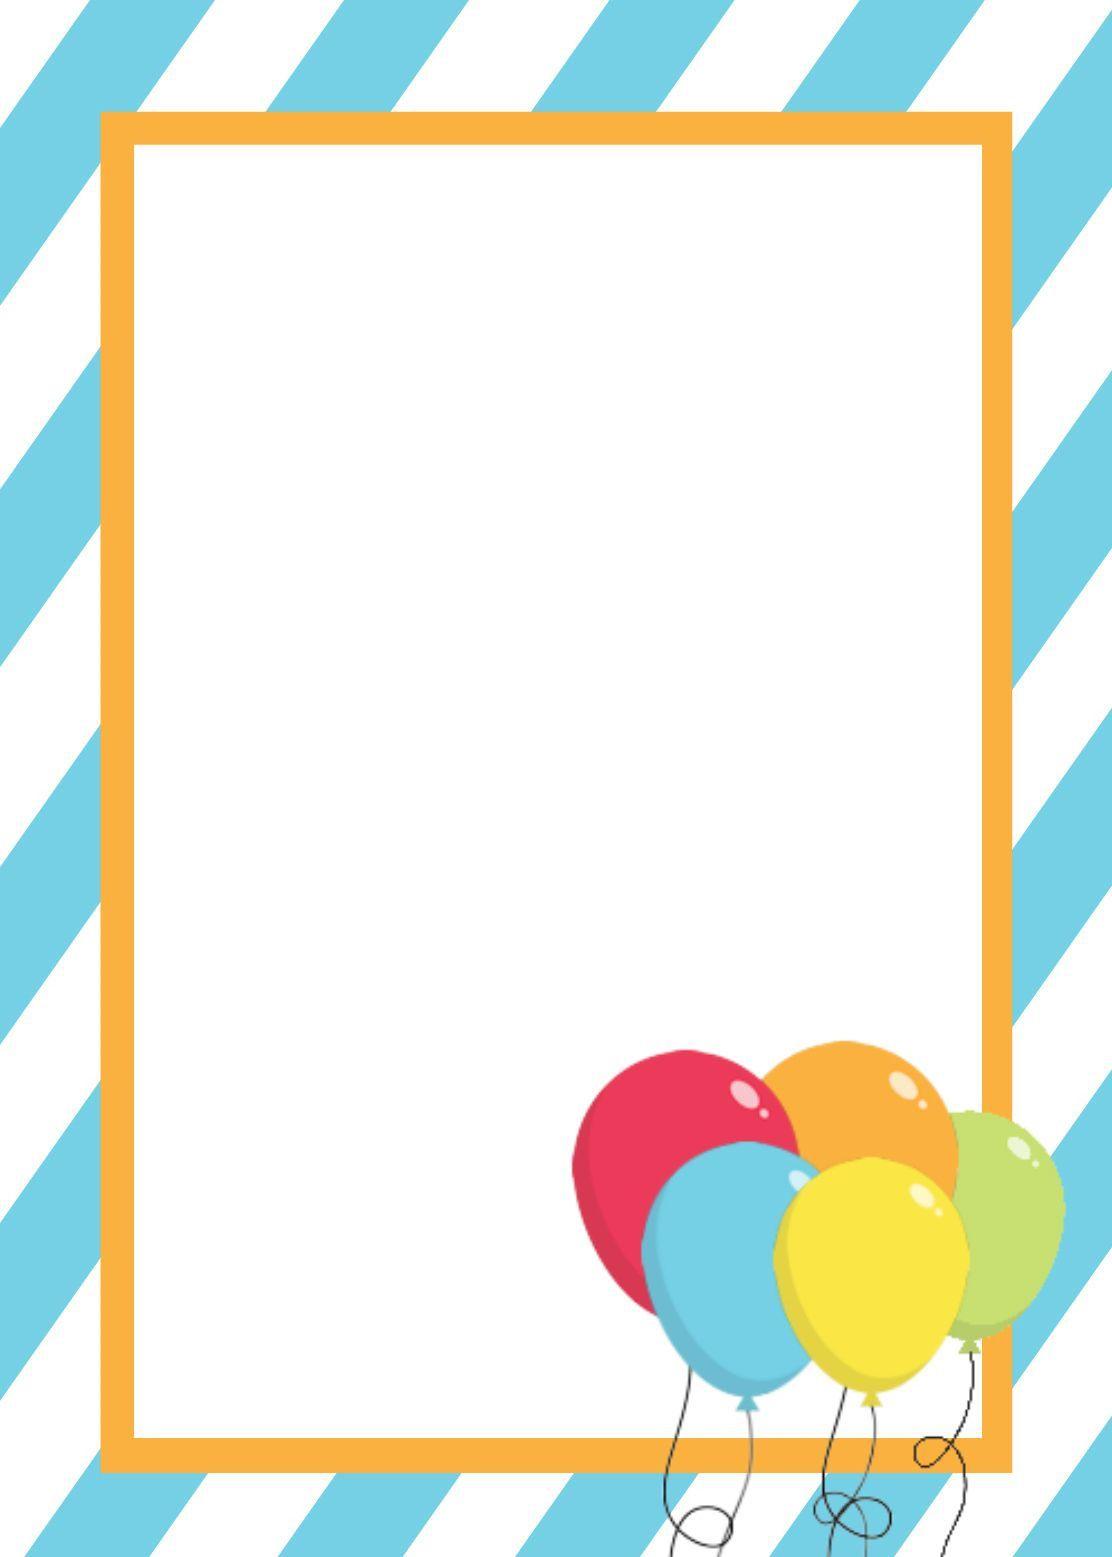 002 Staggering Microsoft Word Birthday Invitation Template Inspiration  Editable 50th 60thFull